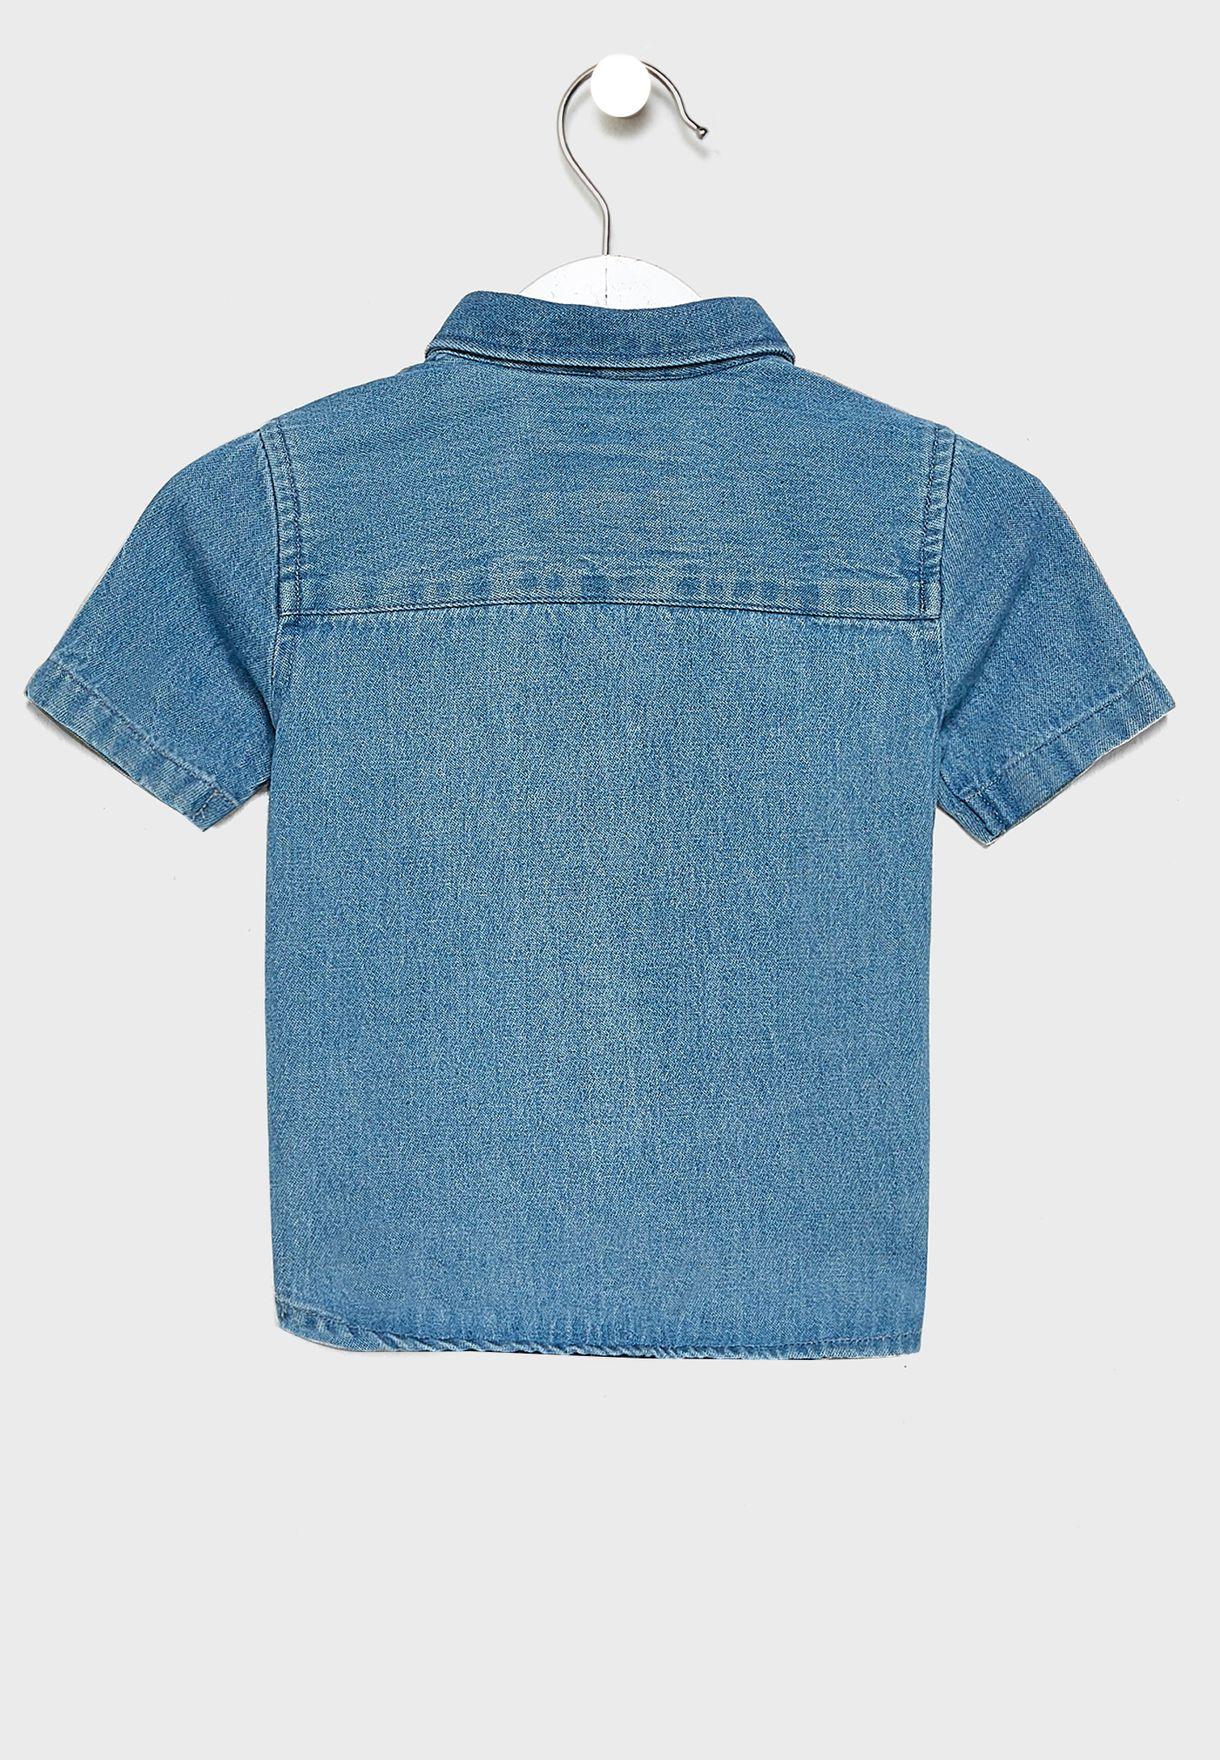 قميص جينز للبيبي